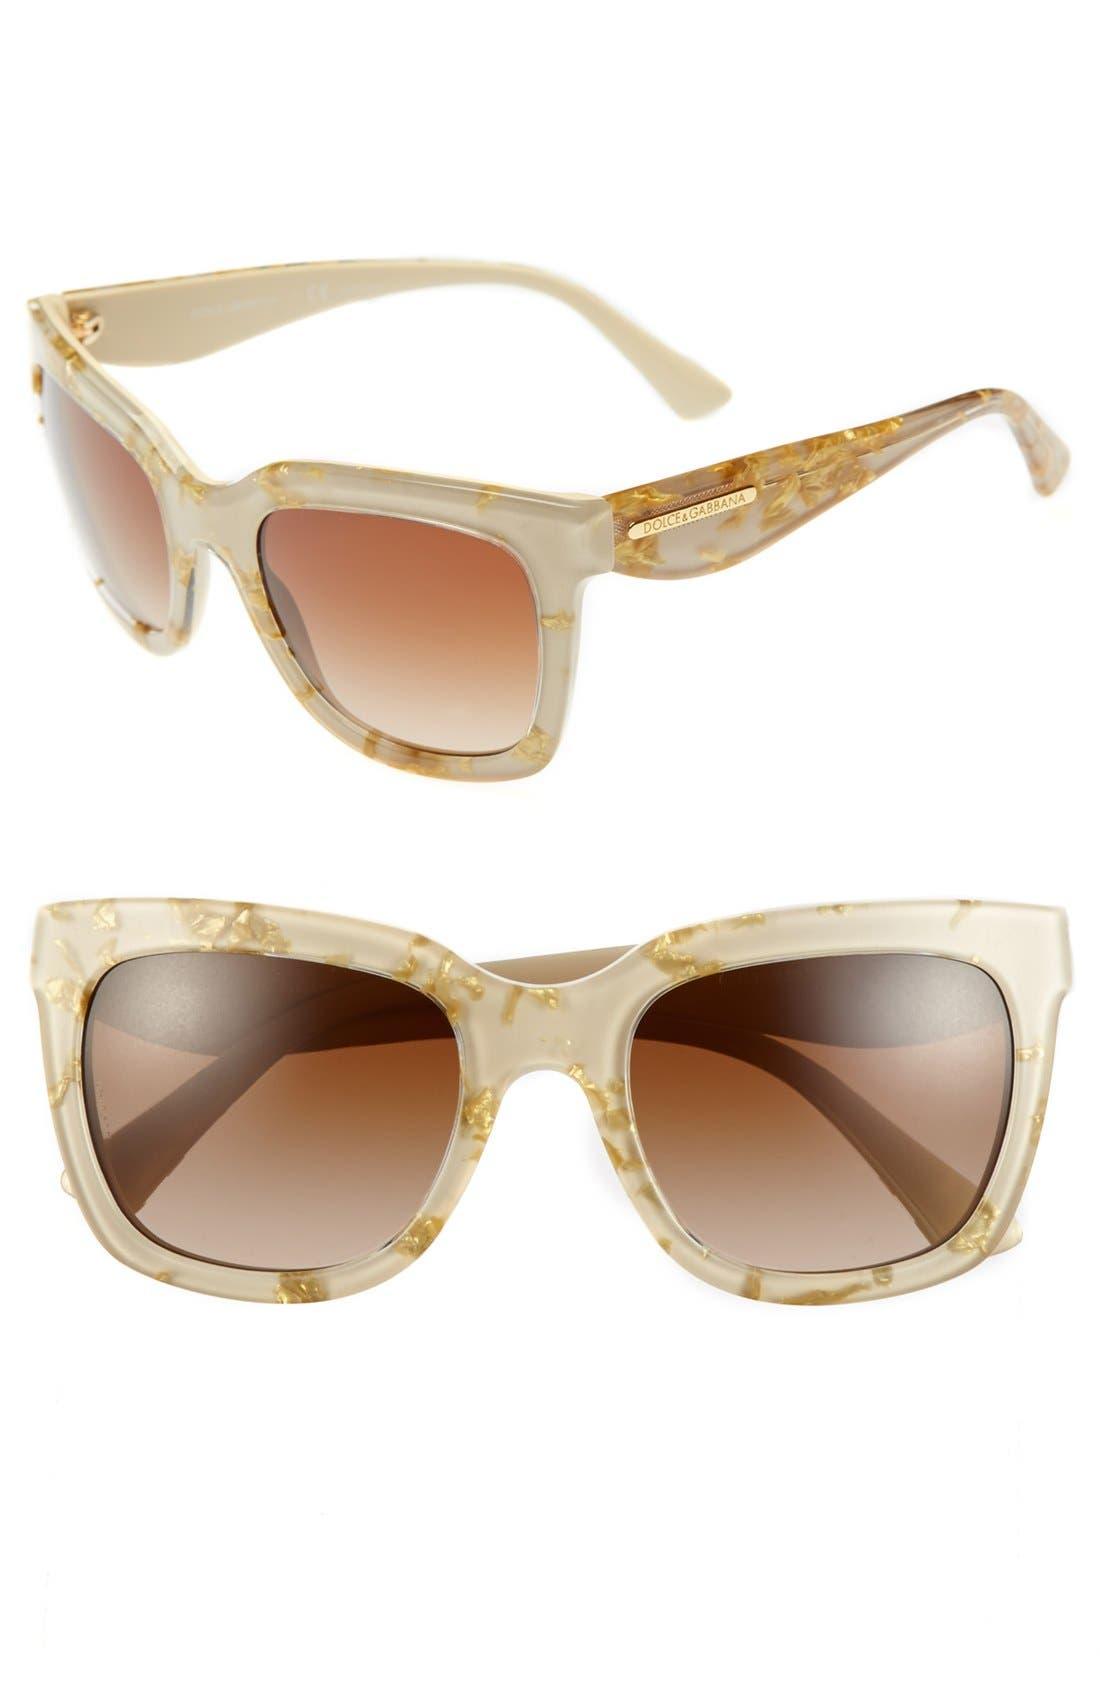 Main Image - Dolce&Gabbana 'Gold Leaf' 53mm Sunglasses